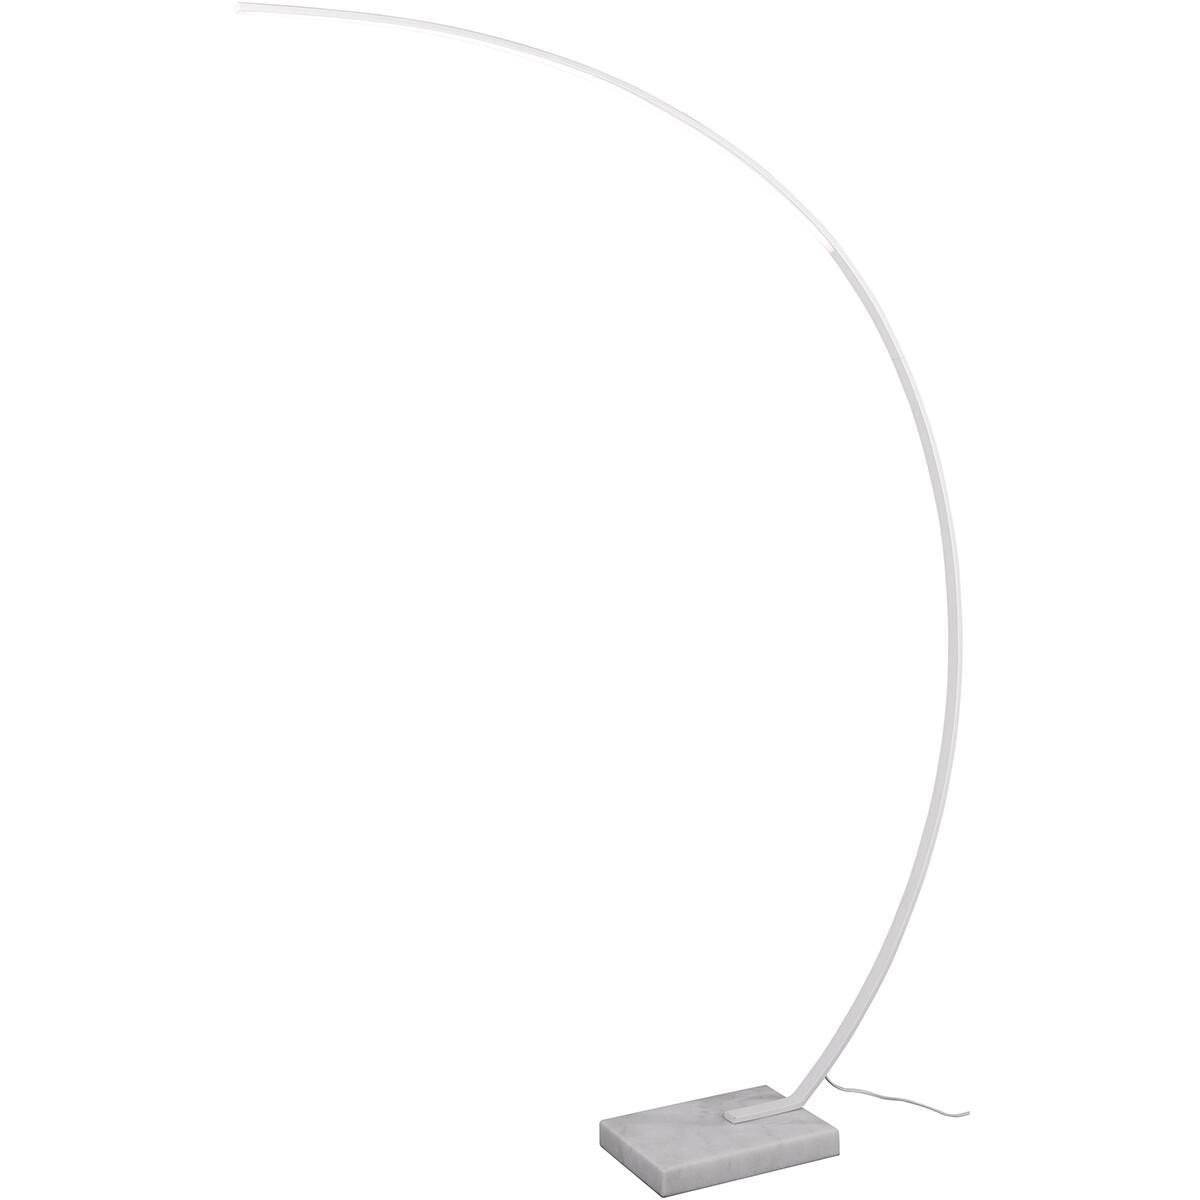 LED Vloerlamp - Trion Bango - 18W - Natuurlijk Wit 4000K - Rechthoek - Mat Wit - Aluminium